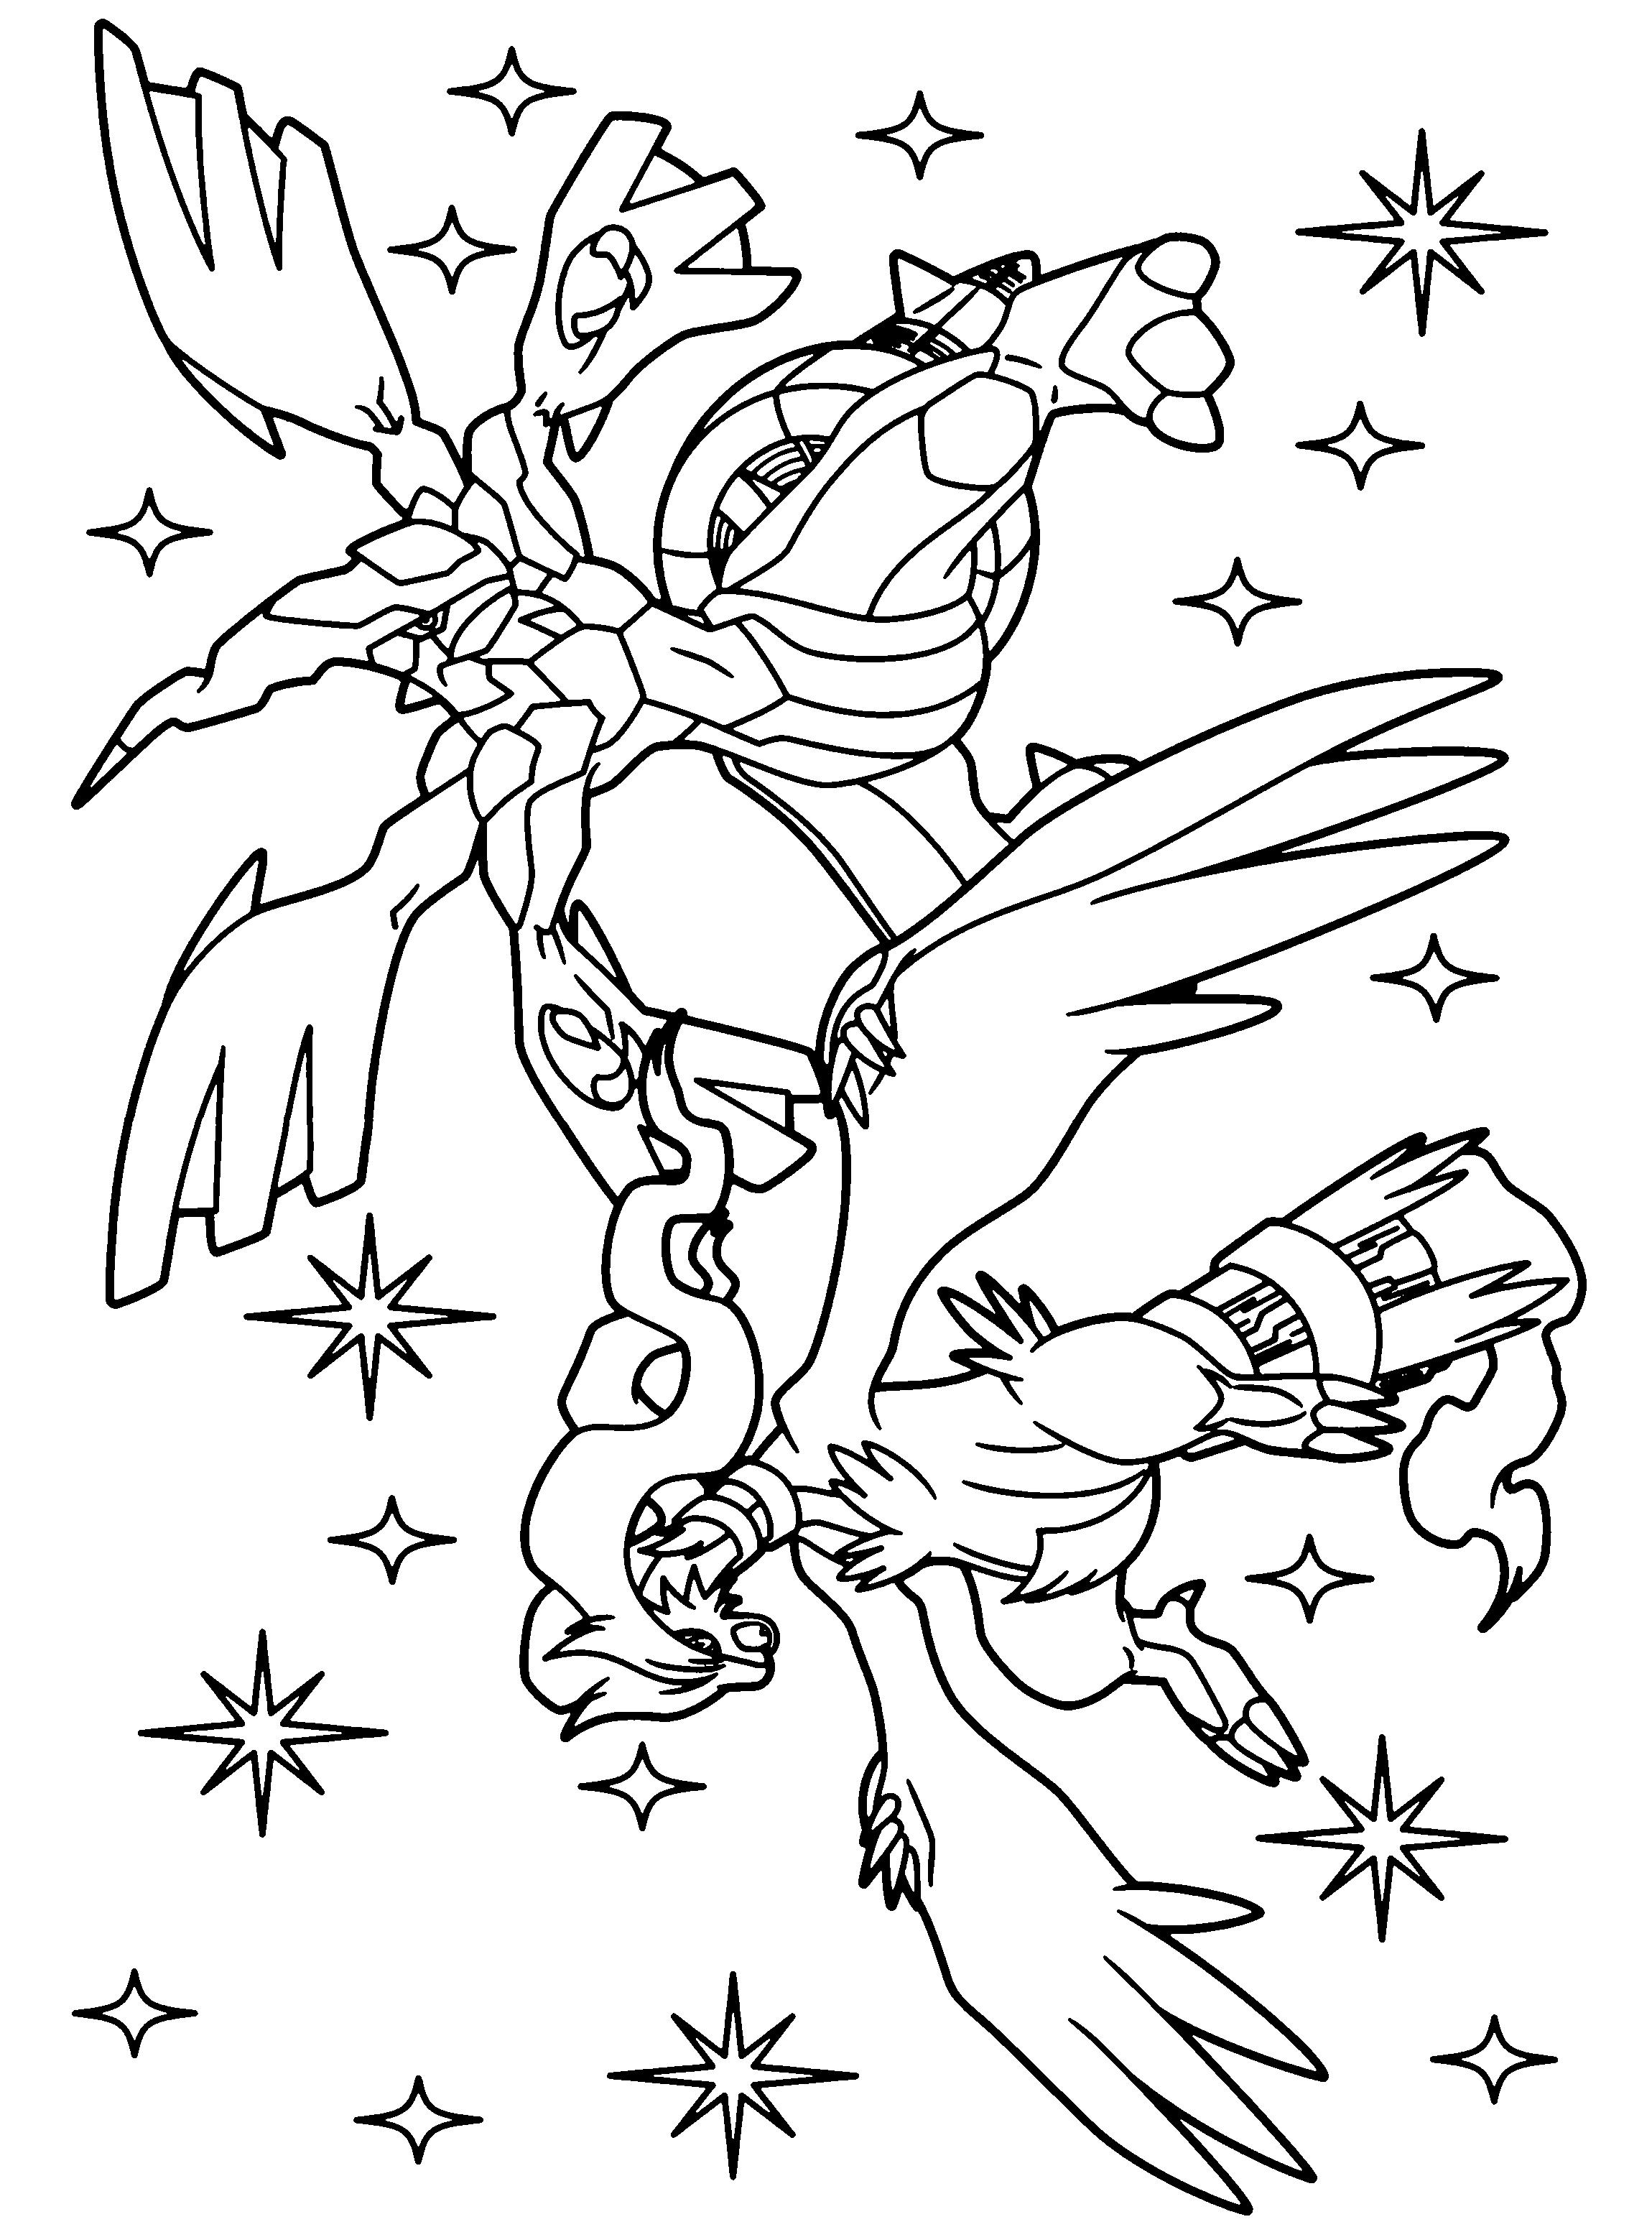 20 dessins de coloriage pokemon zekrom imprimer - Dessin pokemon ...